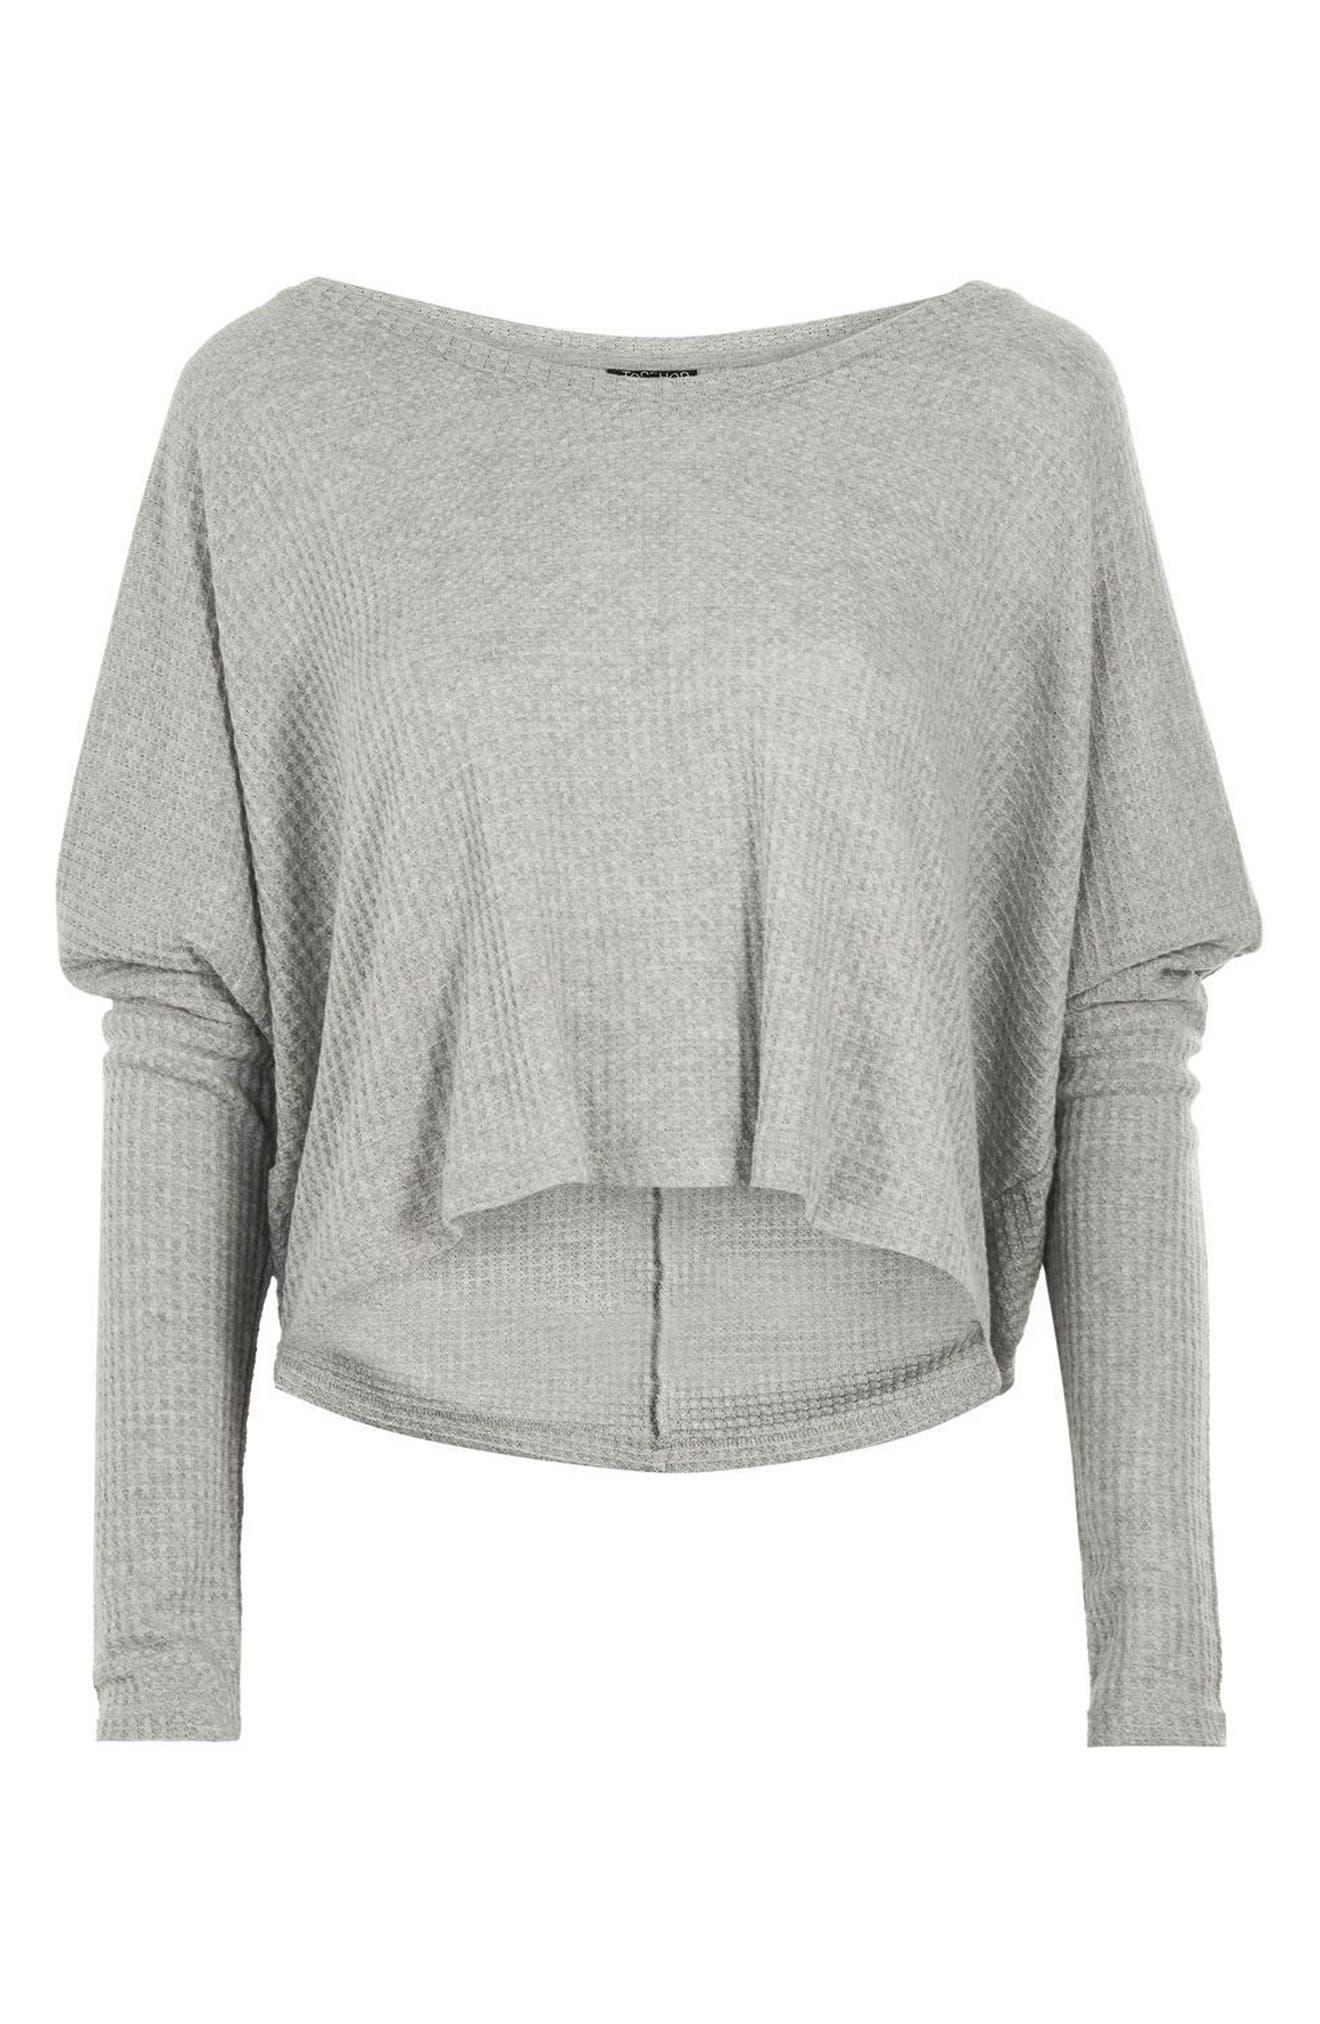 Waffle Knit Sweatshirt,                             Alternate thumbnail 3, color,                             Grey Marl